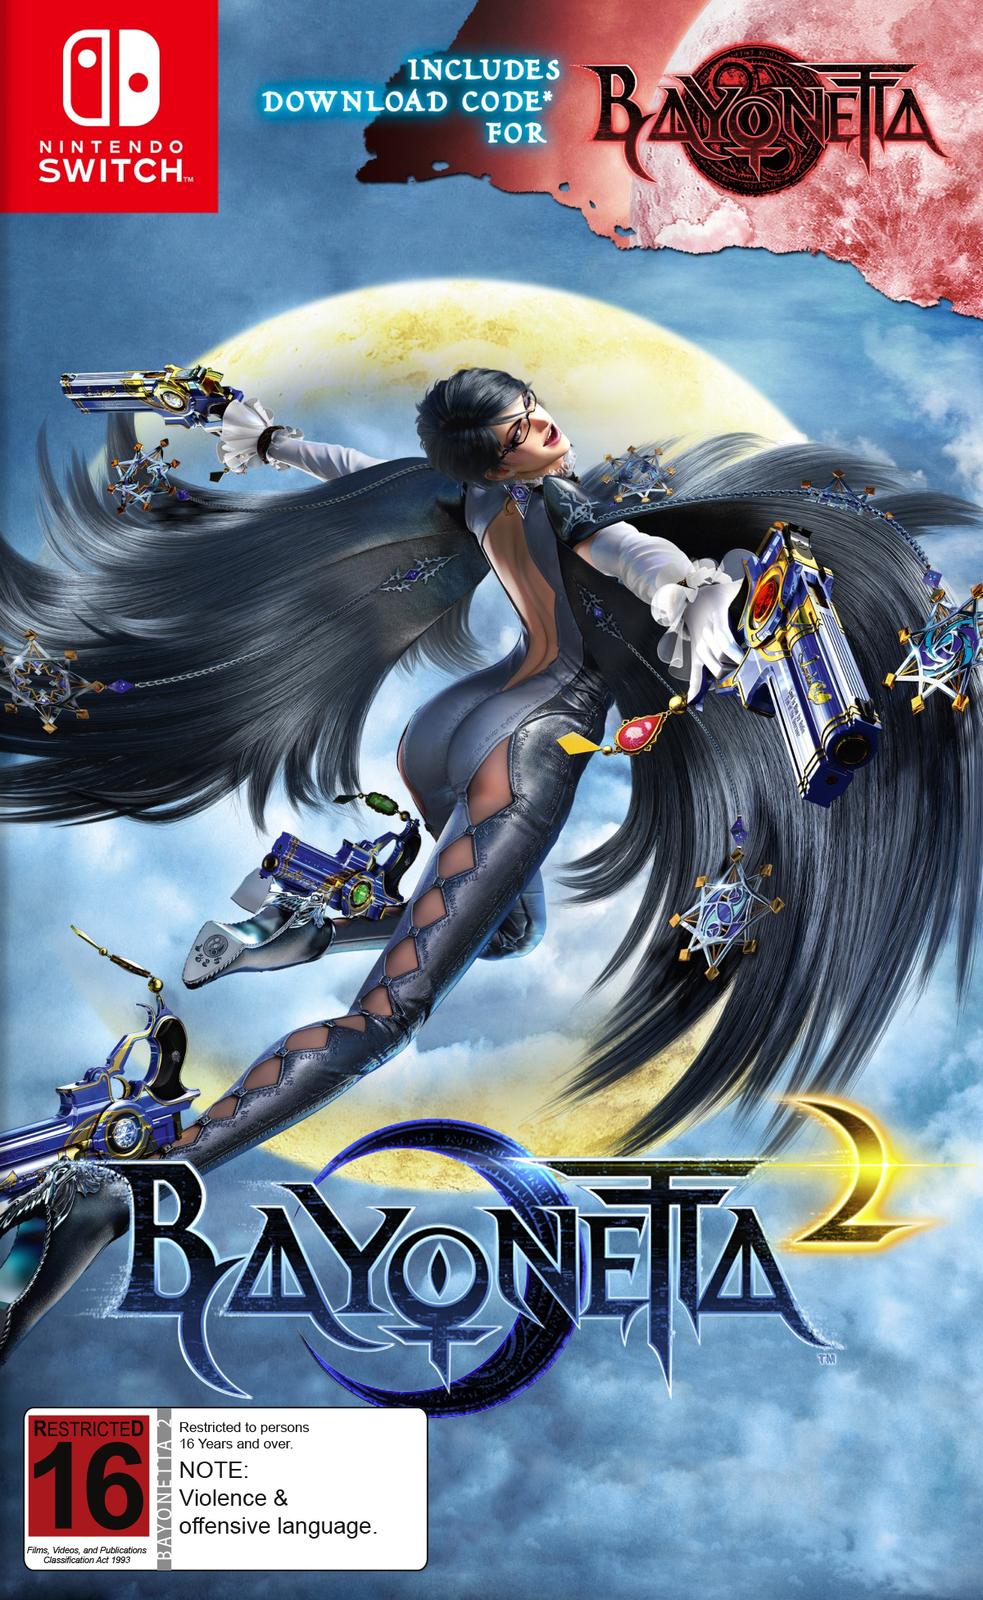 Bayonetta 2 for Switch image